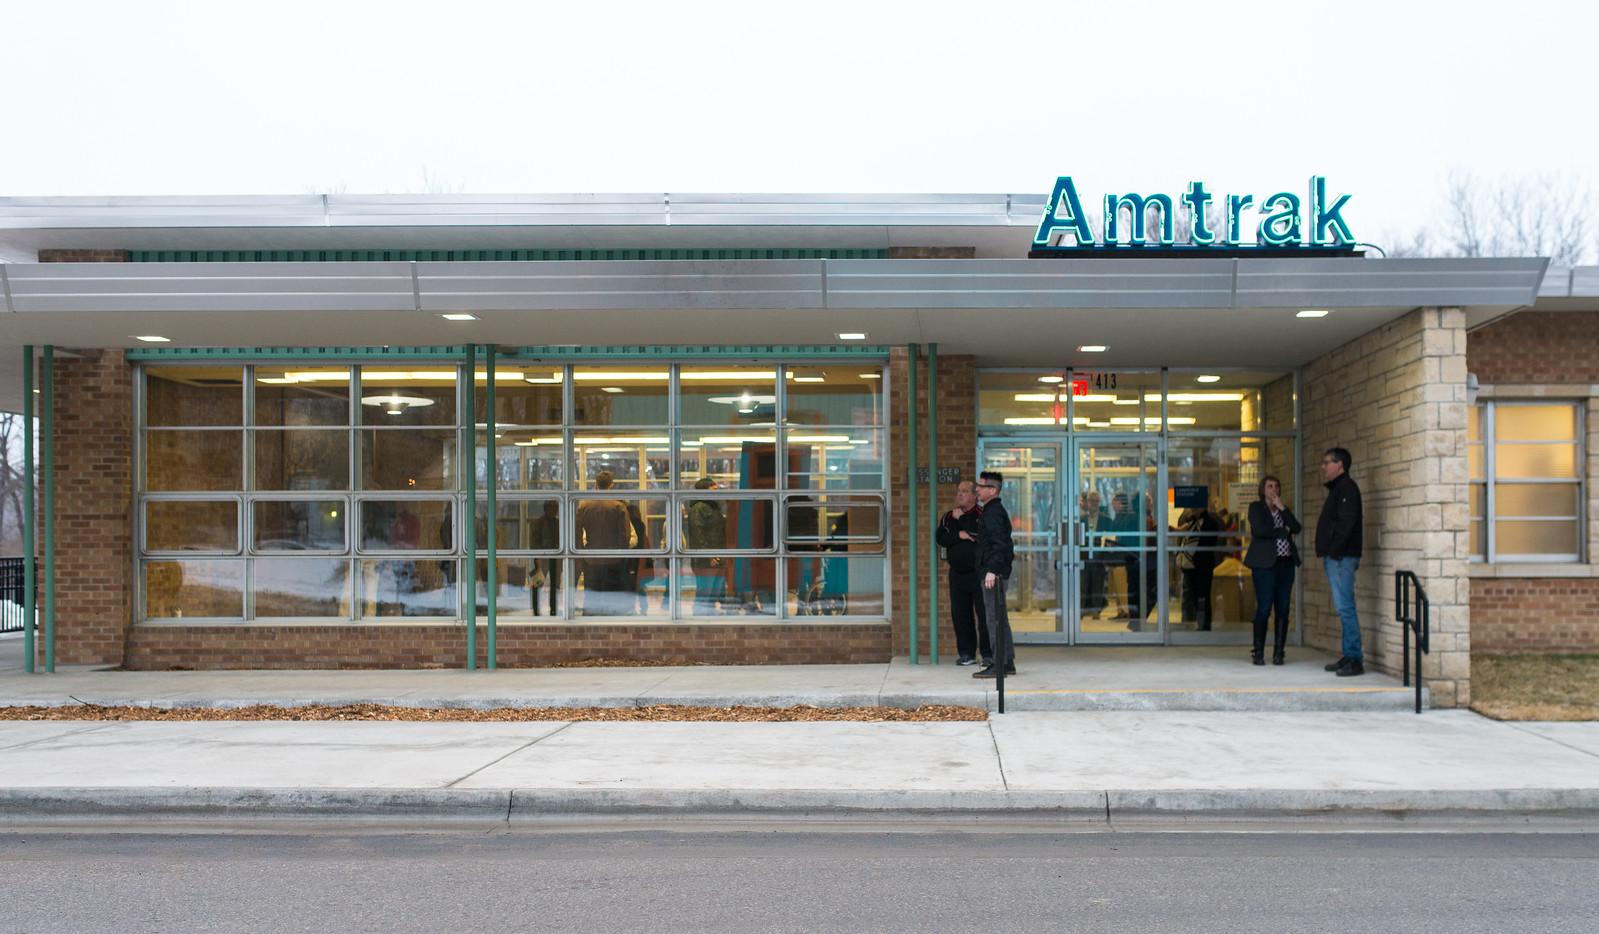 The renovated Santa Fe Depot. Photo by Leilani Photographs